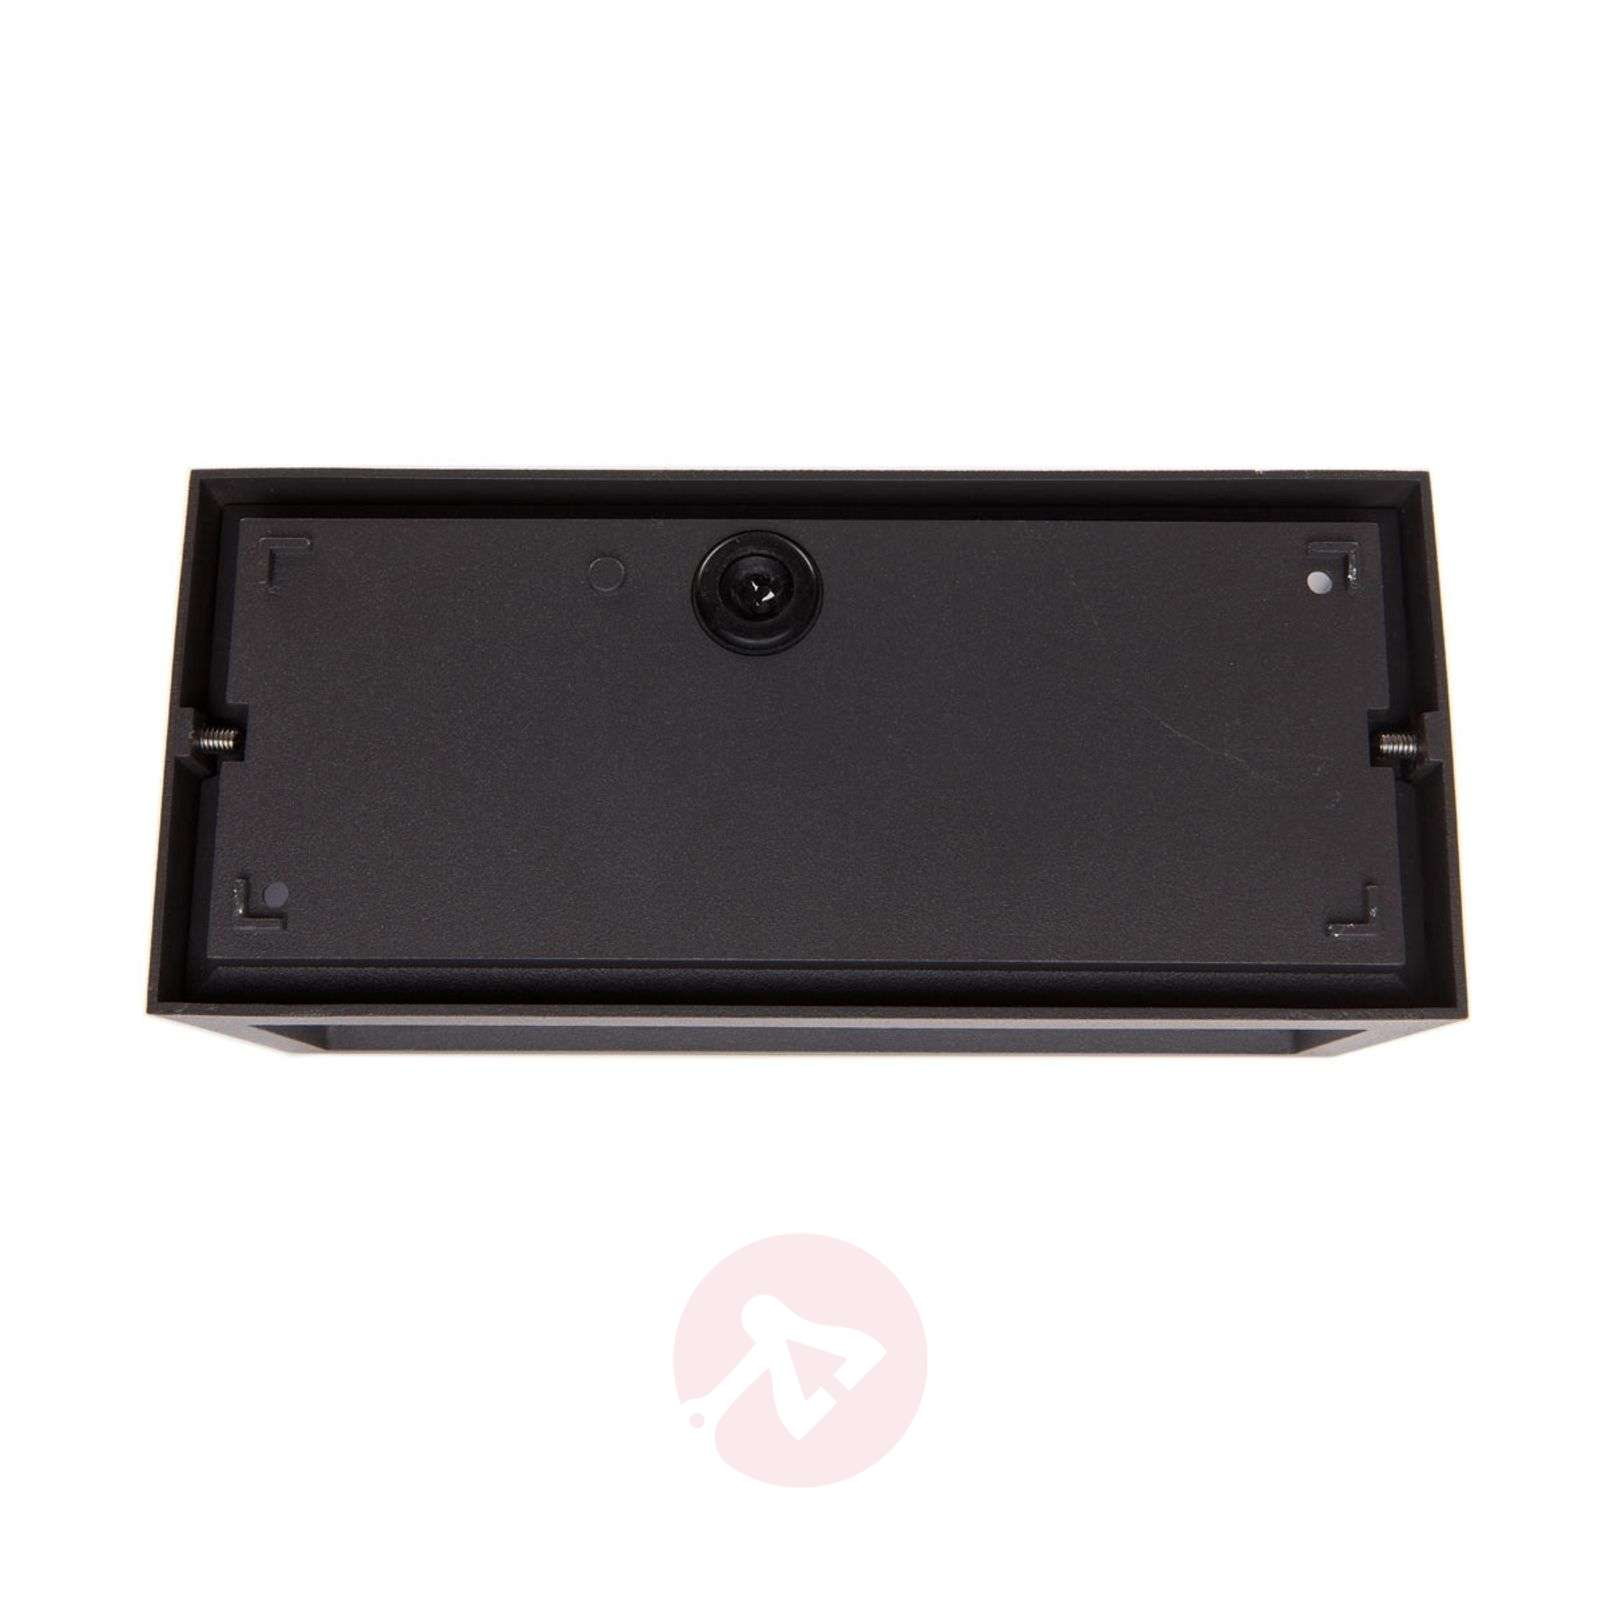 Bente rectangular outdoor wall light, graphite-9616022-01